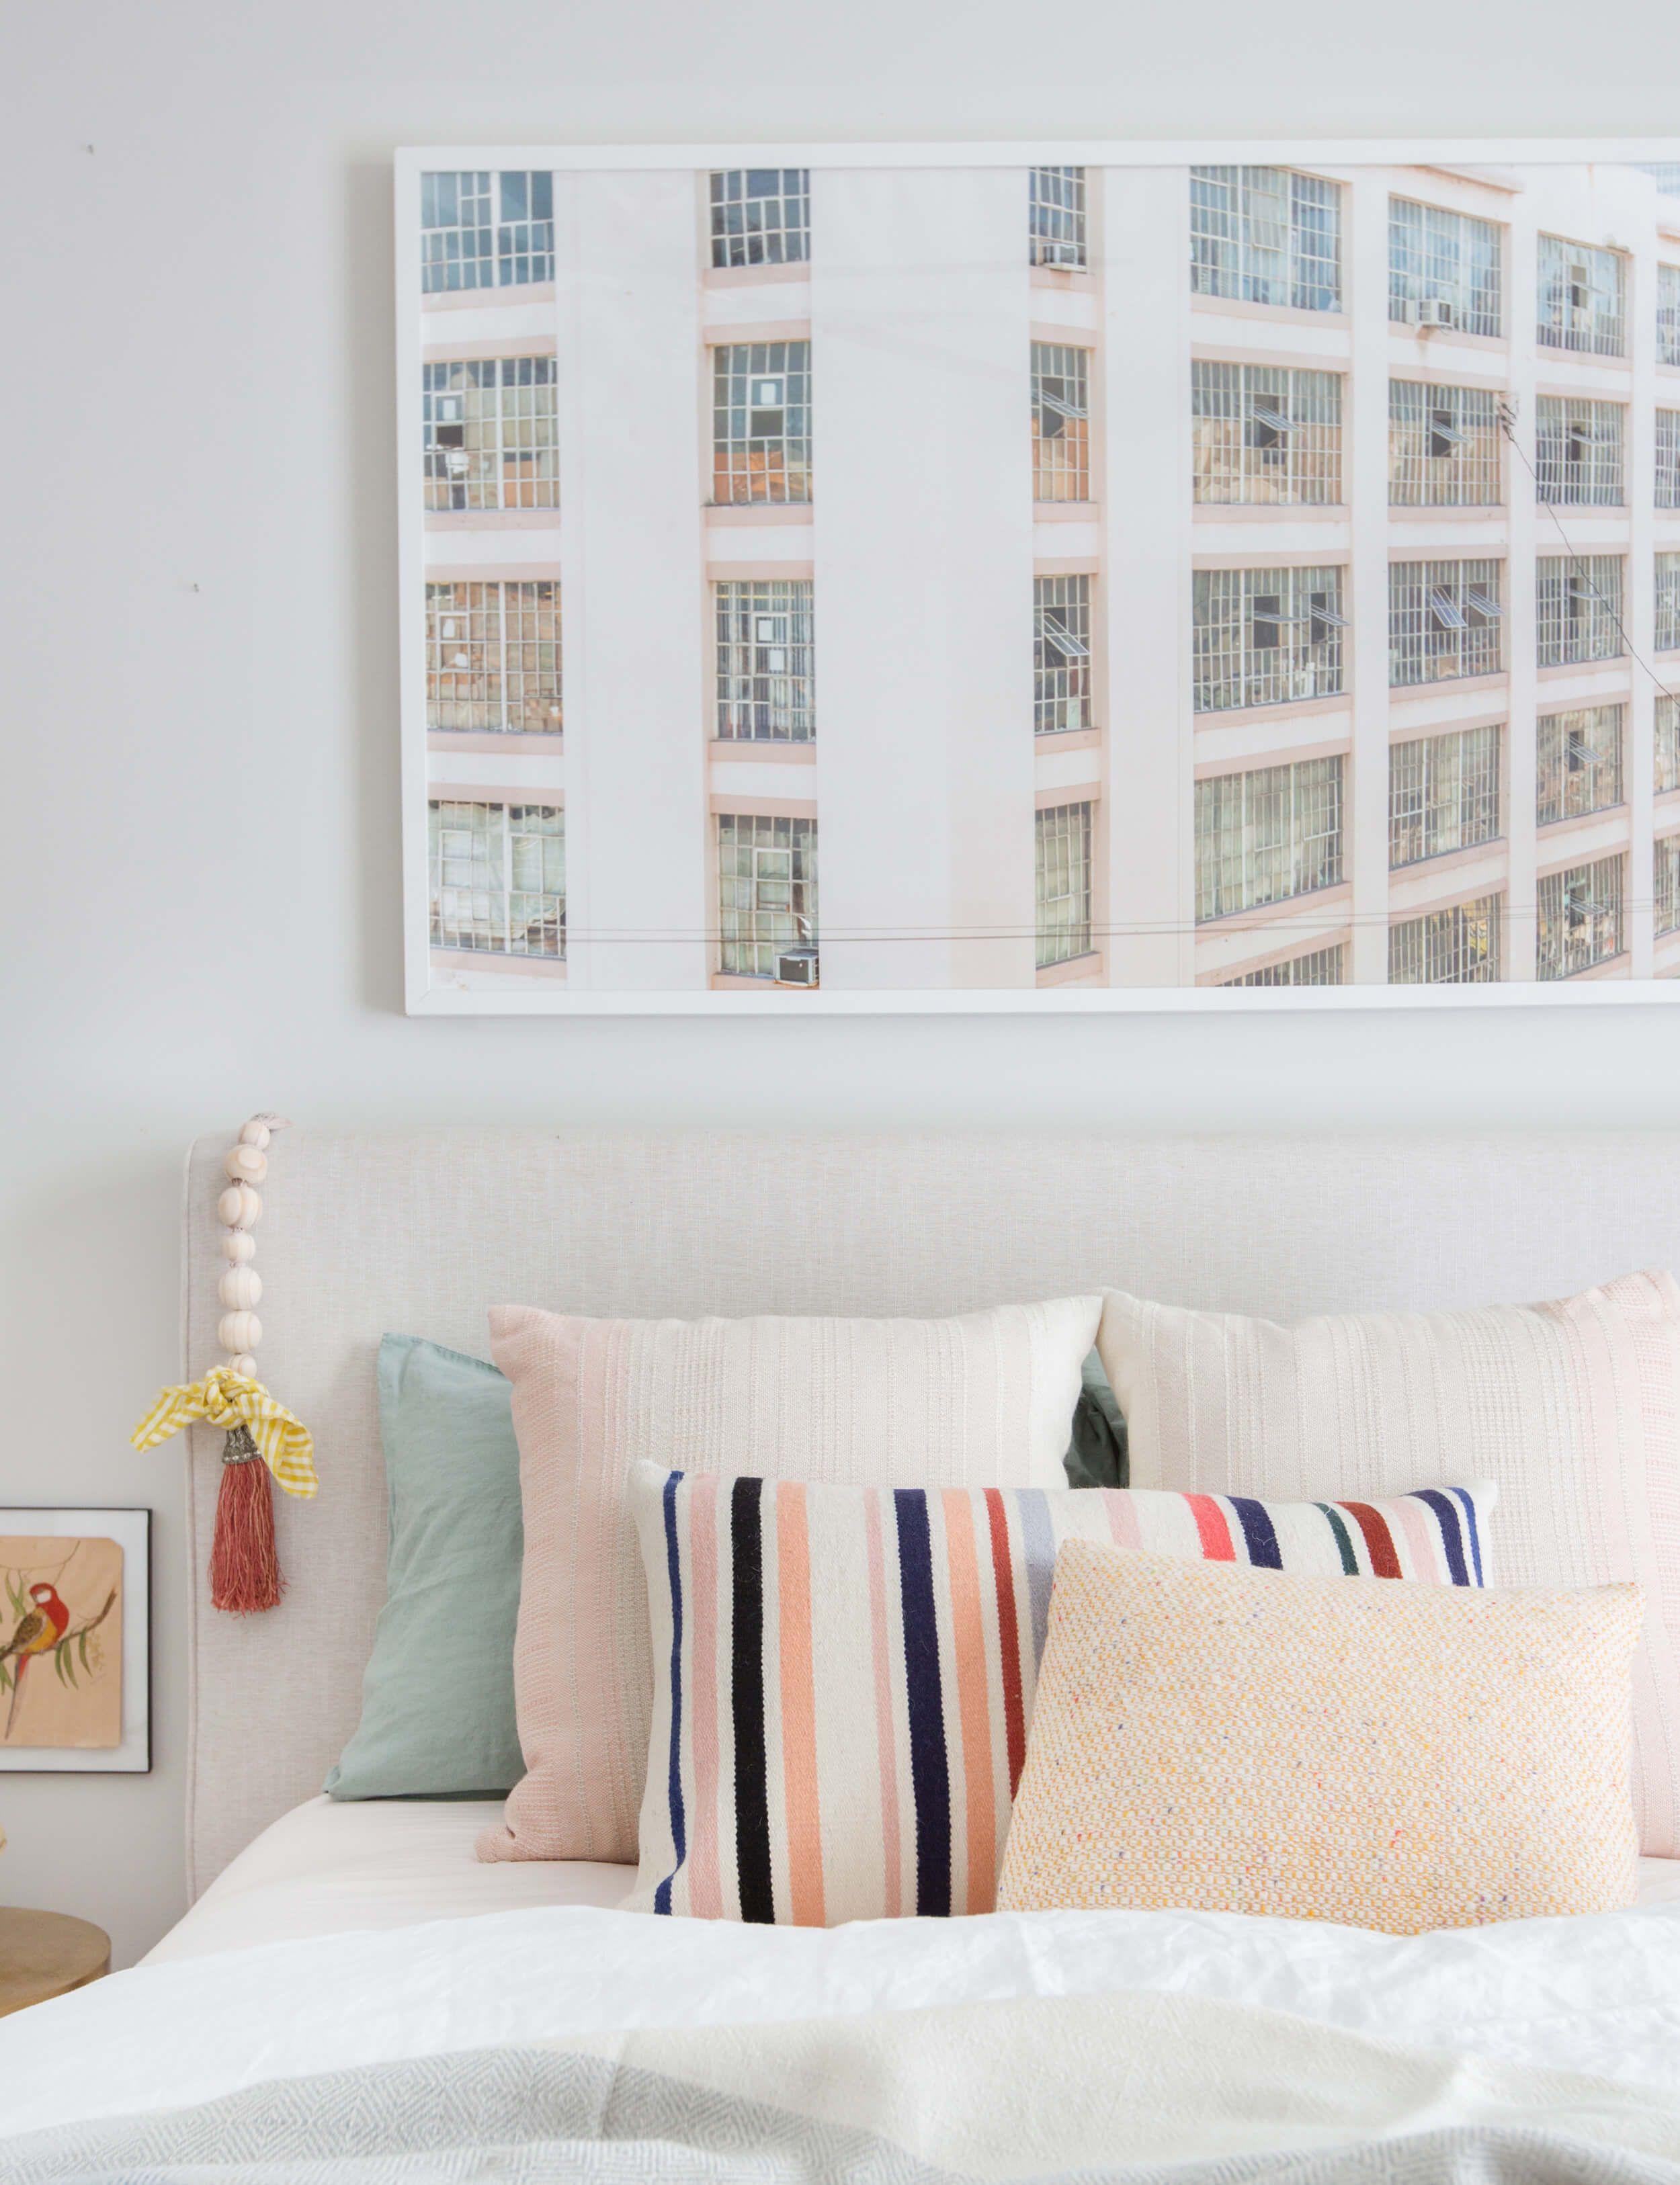 How To Mix Decorative Pillows 20 Guaranteed To Look Good